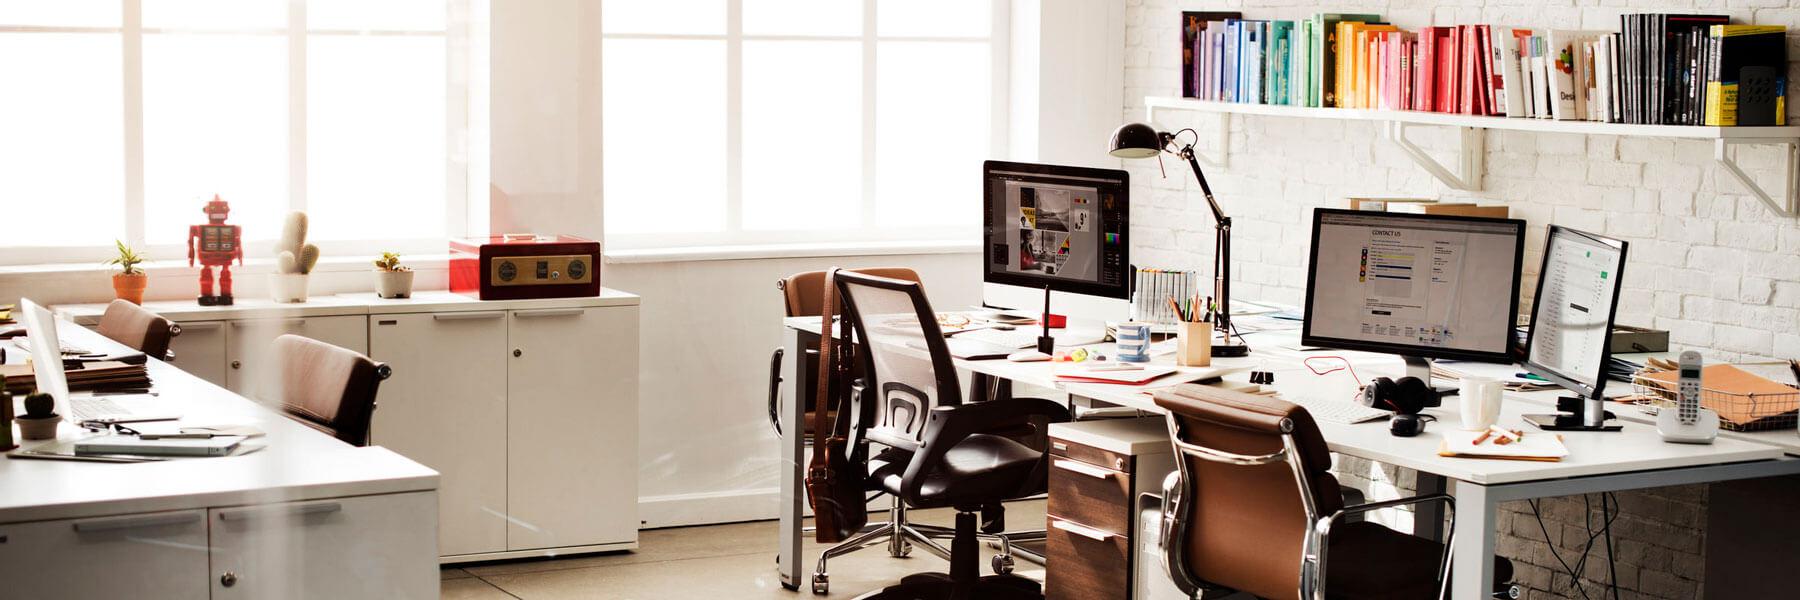 Scalar Enterprises - Web Design Portsmouth - Internet Marketing Portsmouth